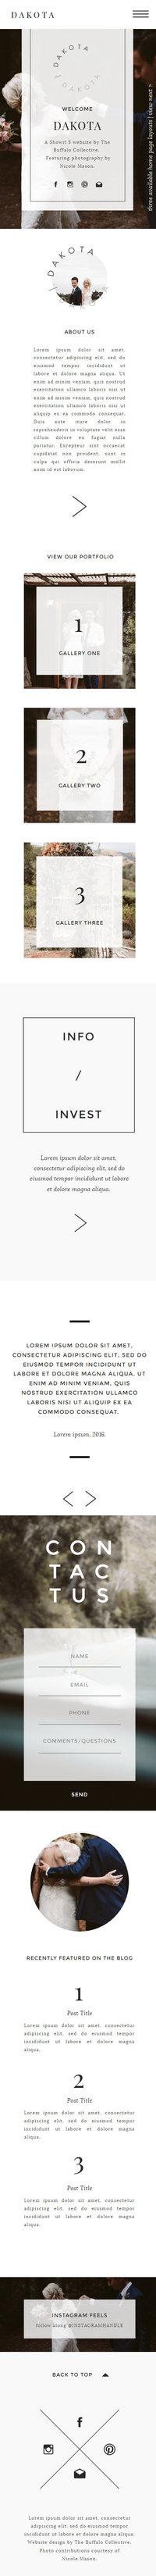 design-dakota-m